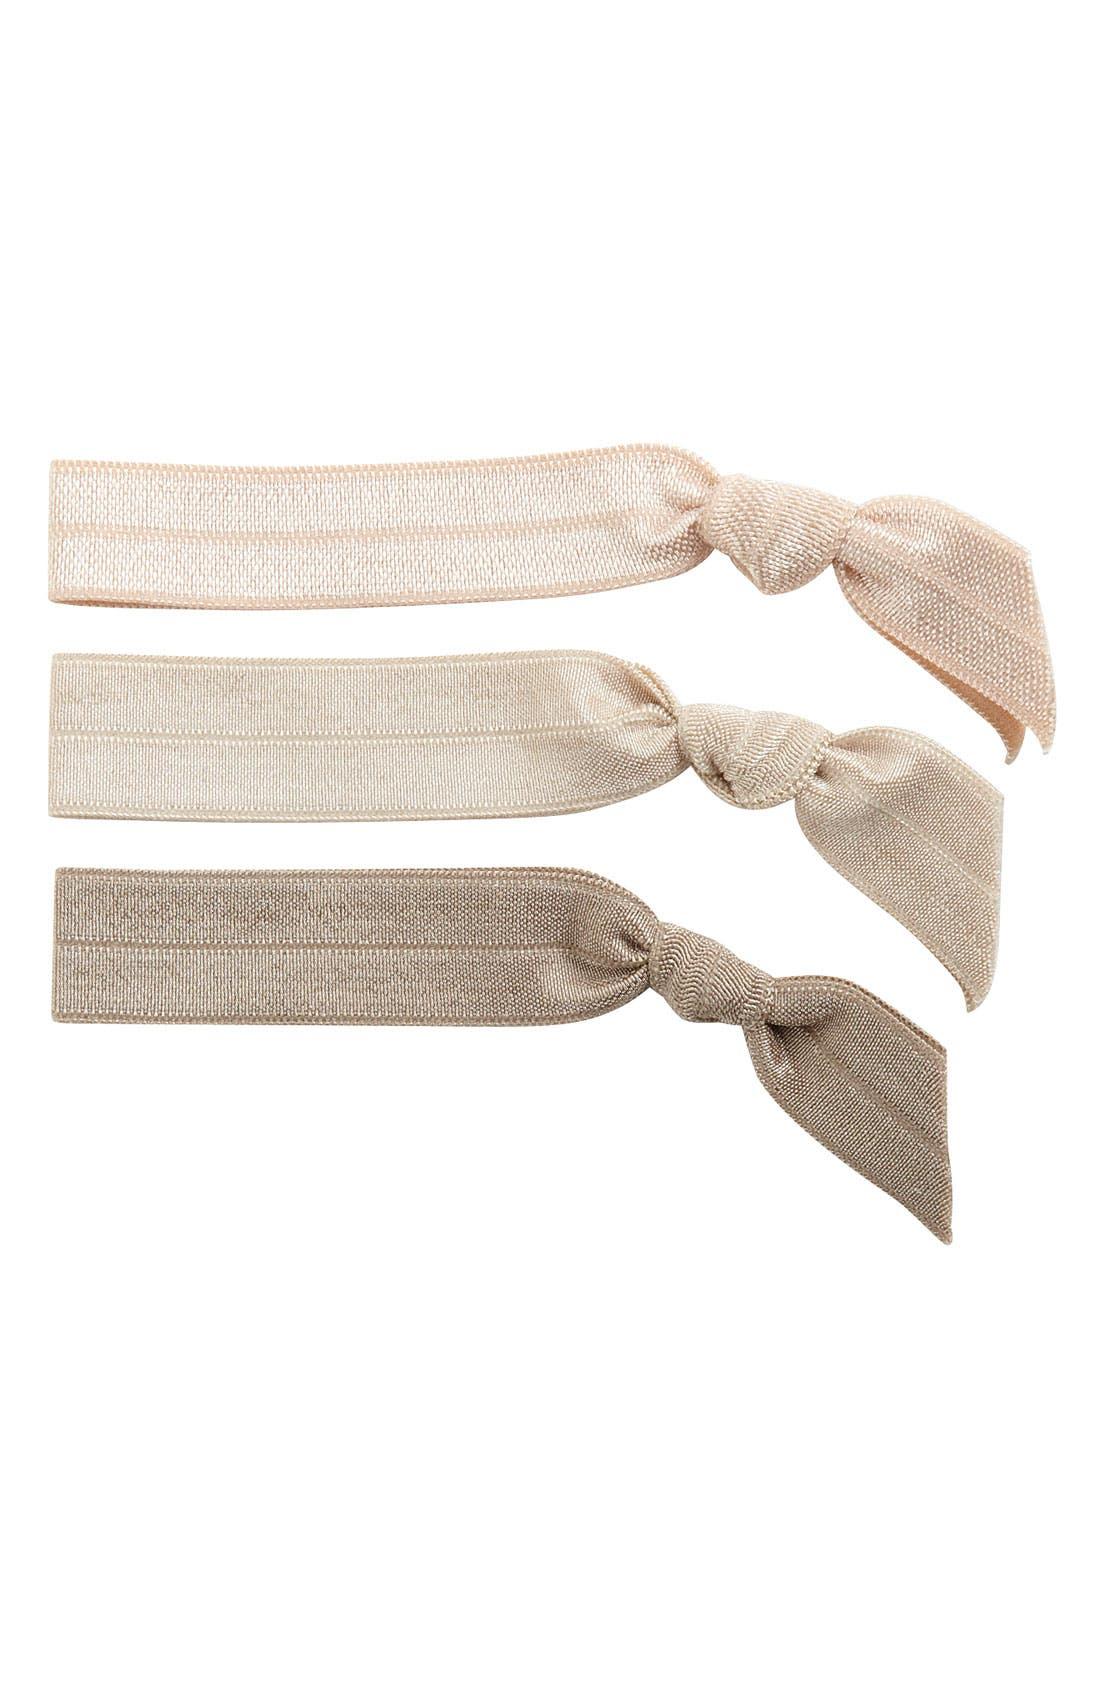 EMI-JAY 'Pearl' Hair Ties, Main, color, 000